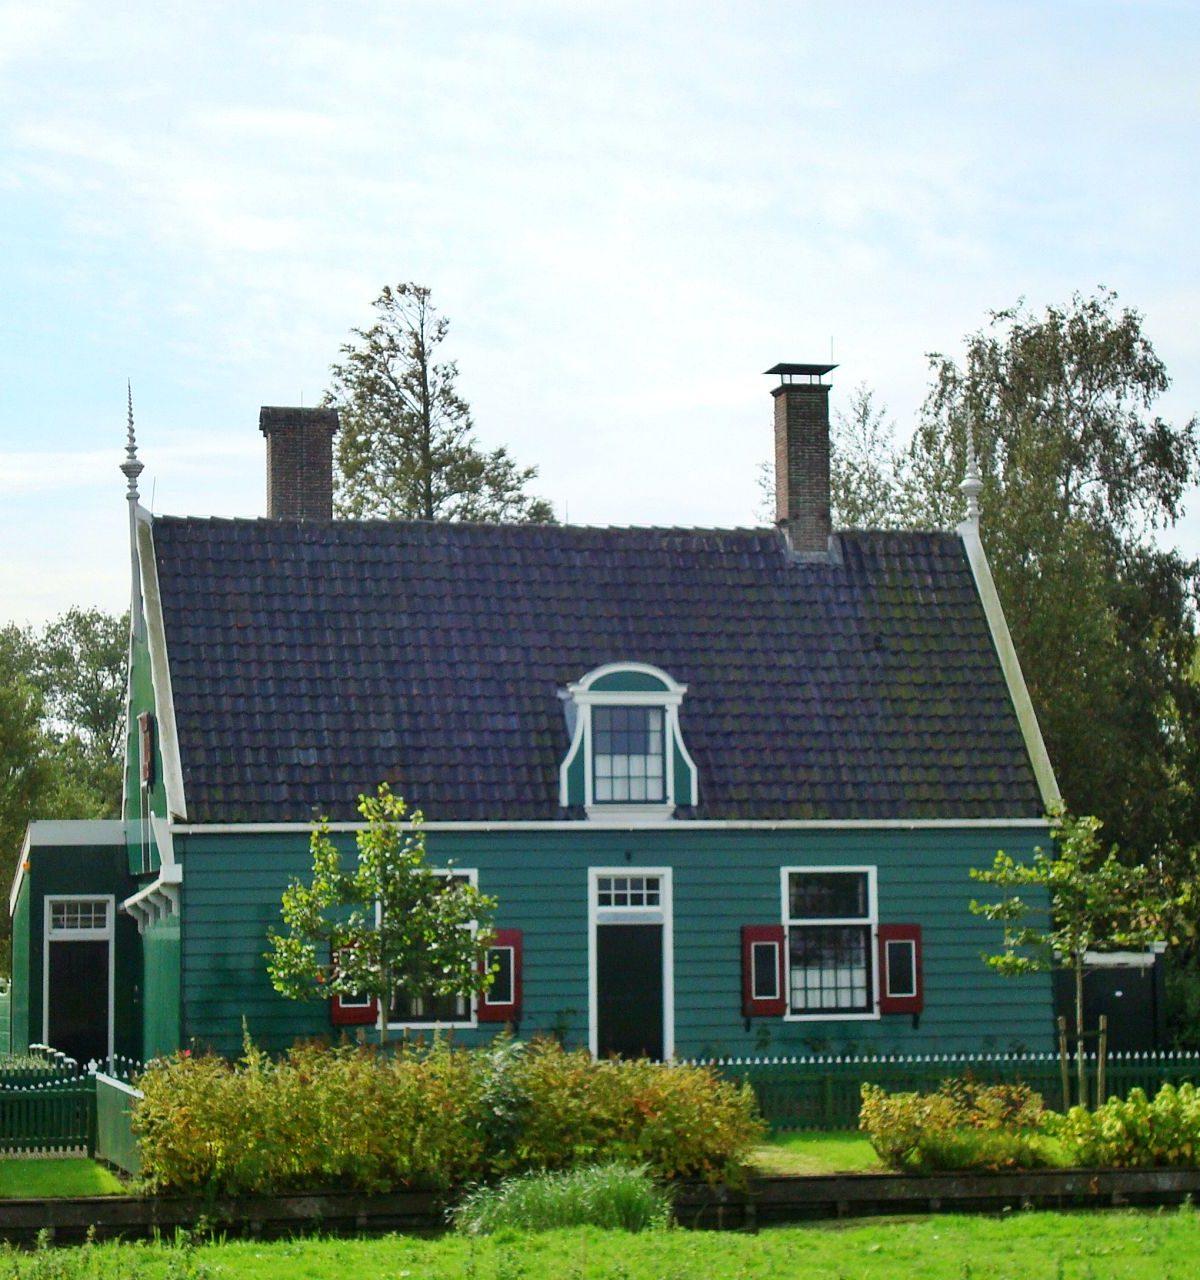 zaanse schans noord holland hotelb&b lanormande westwoud07